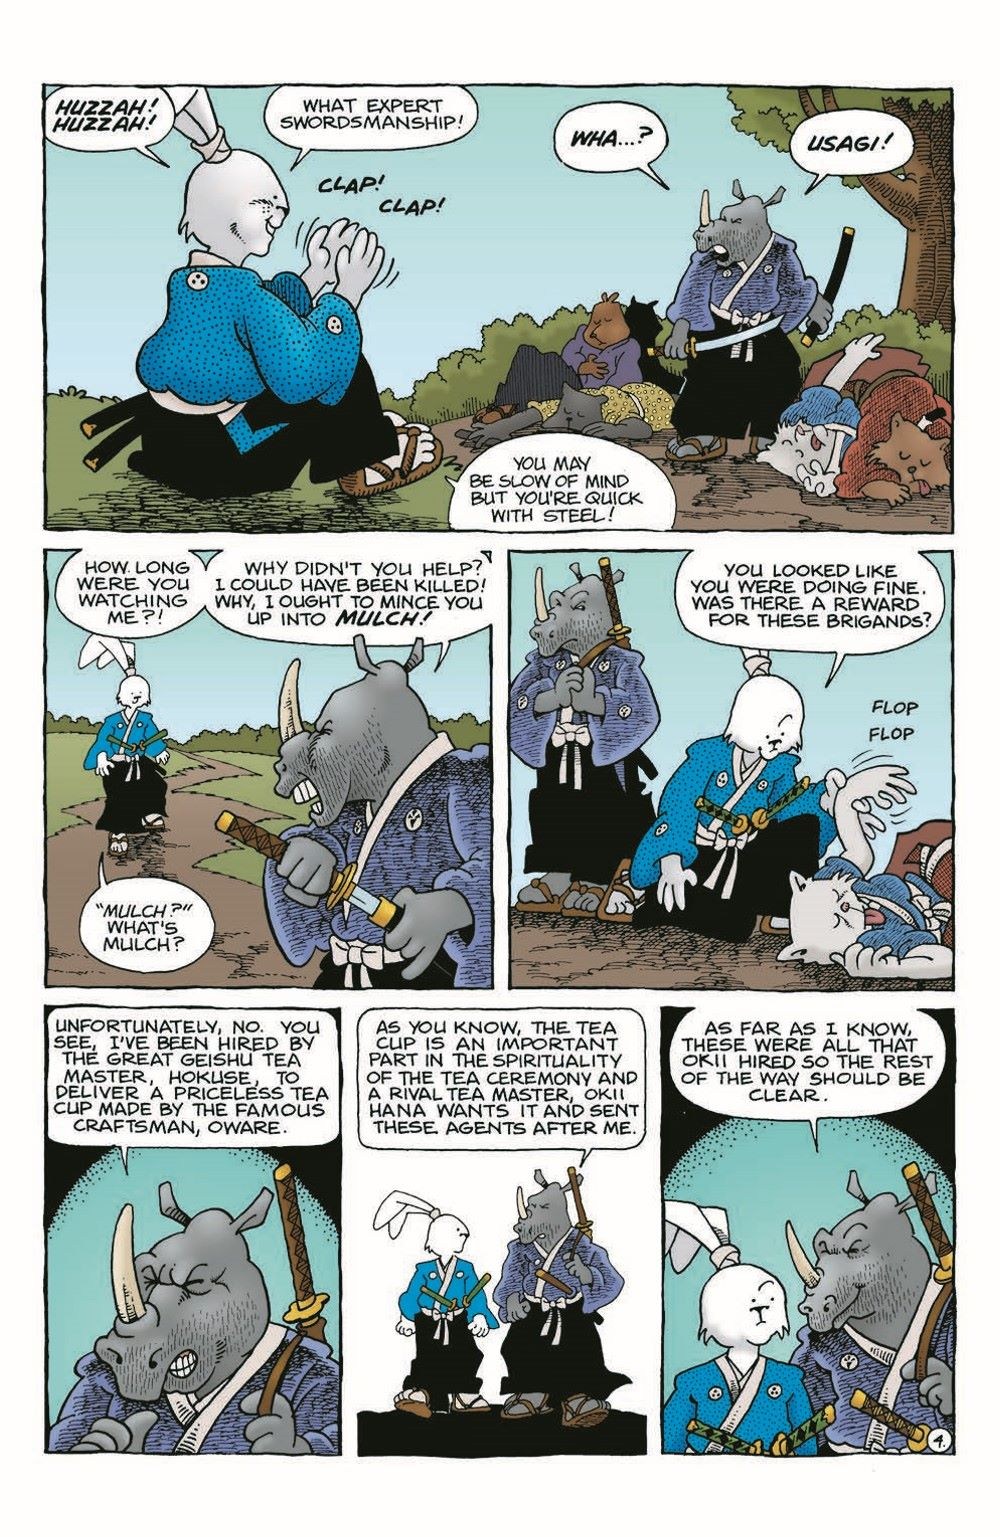 Usagi-WR05_pr-6 ComicList Previews: USAGI YOJIMBO WANDERER'S ROAD #5 (OF 6)